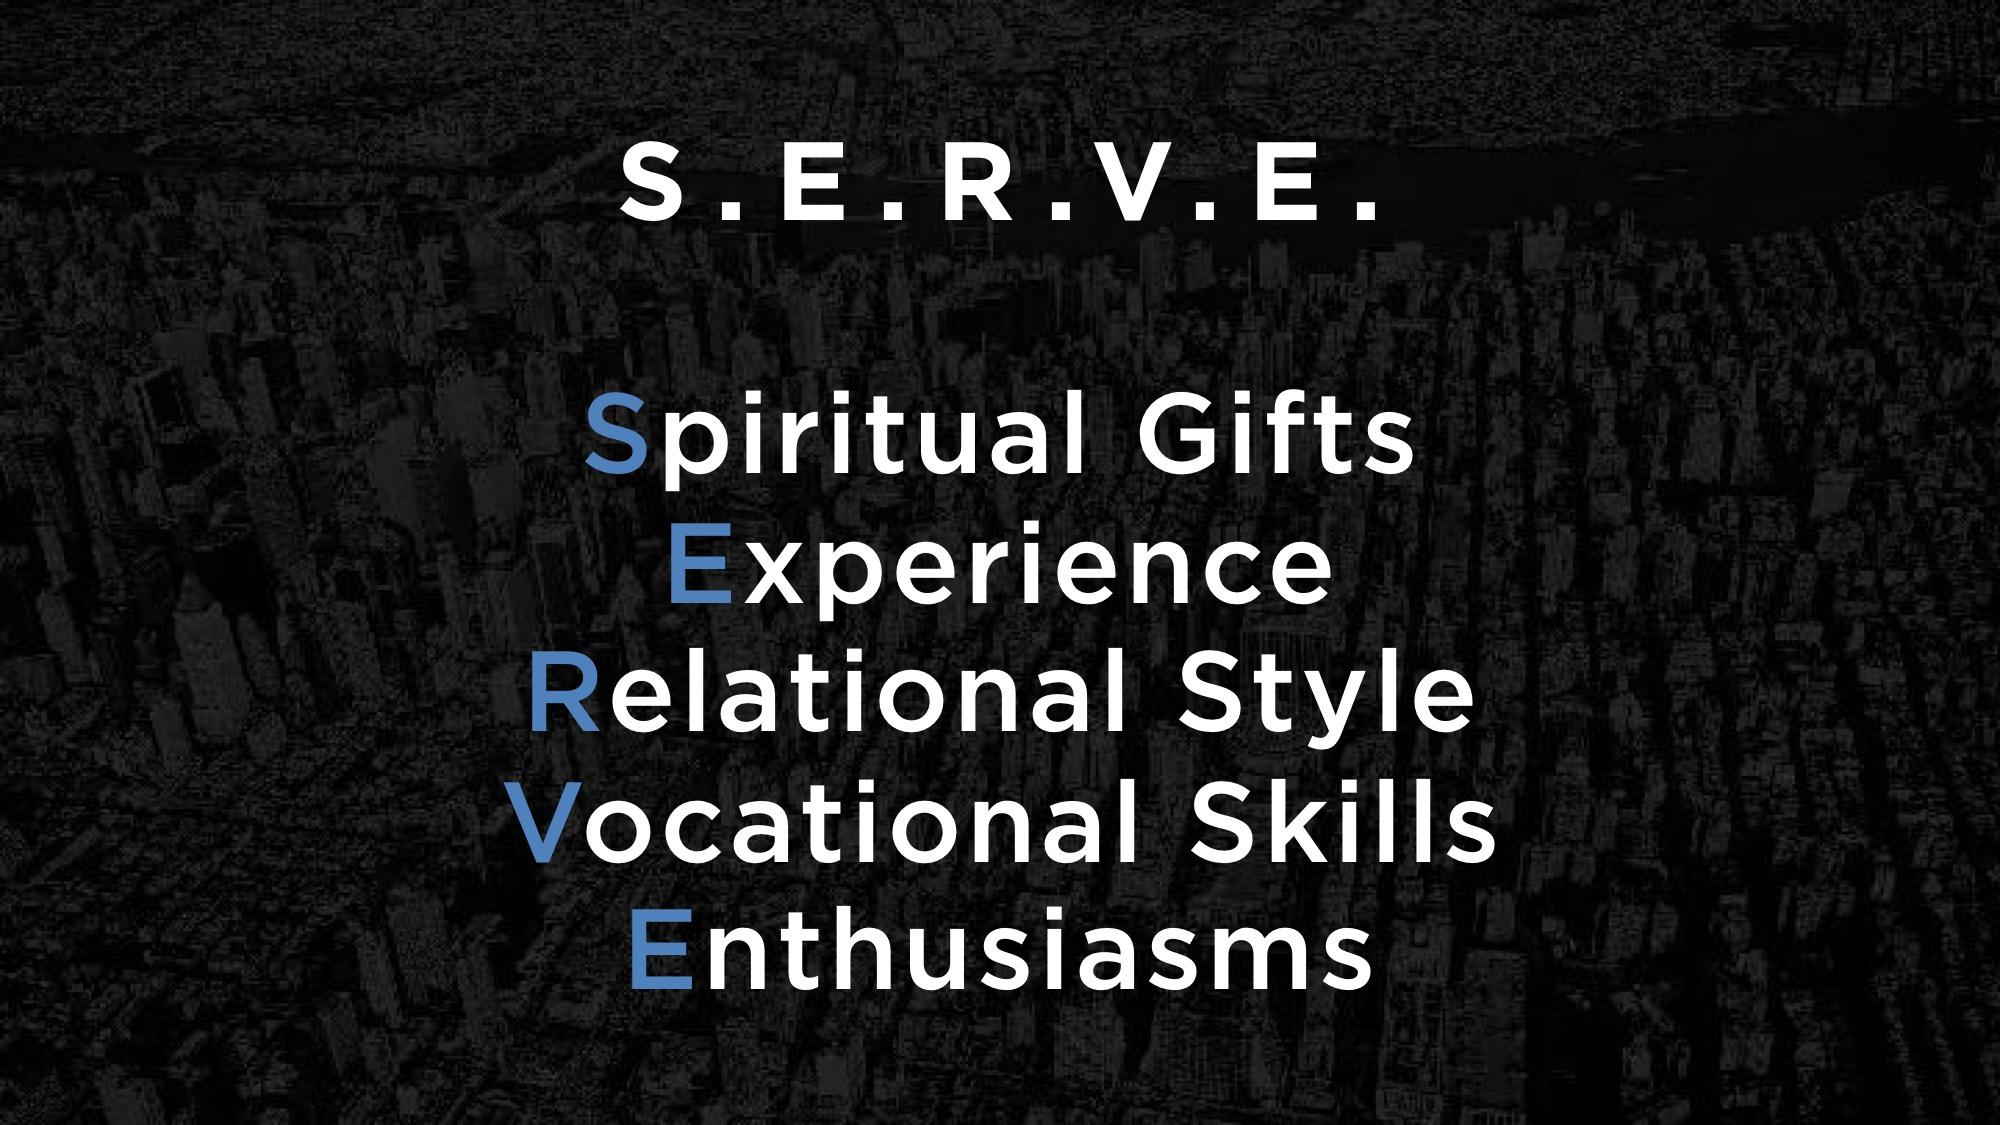 2017-09-24 - Serve Course - Week 2 (Suzy Silk) 19.jpeg